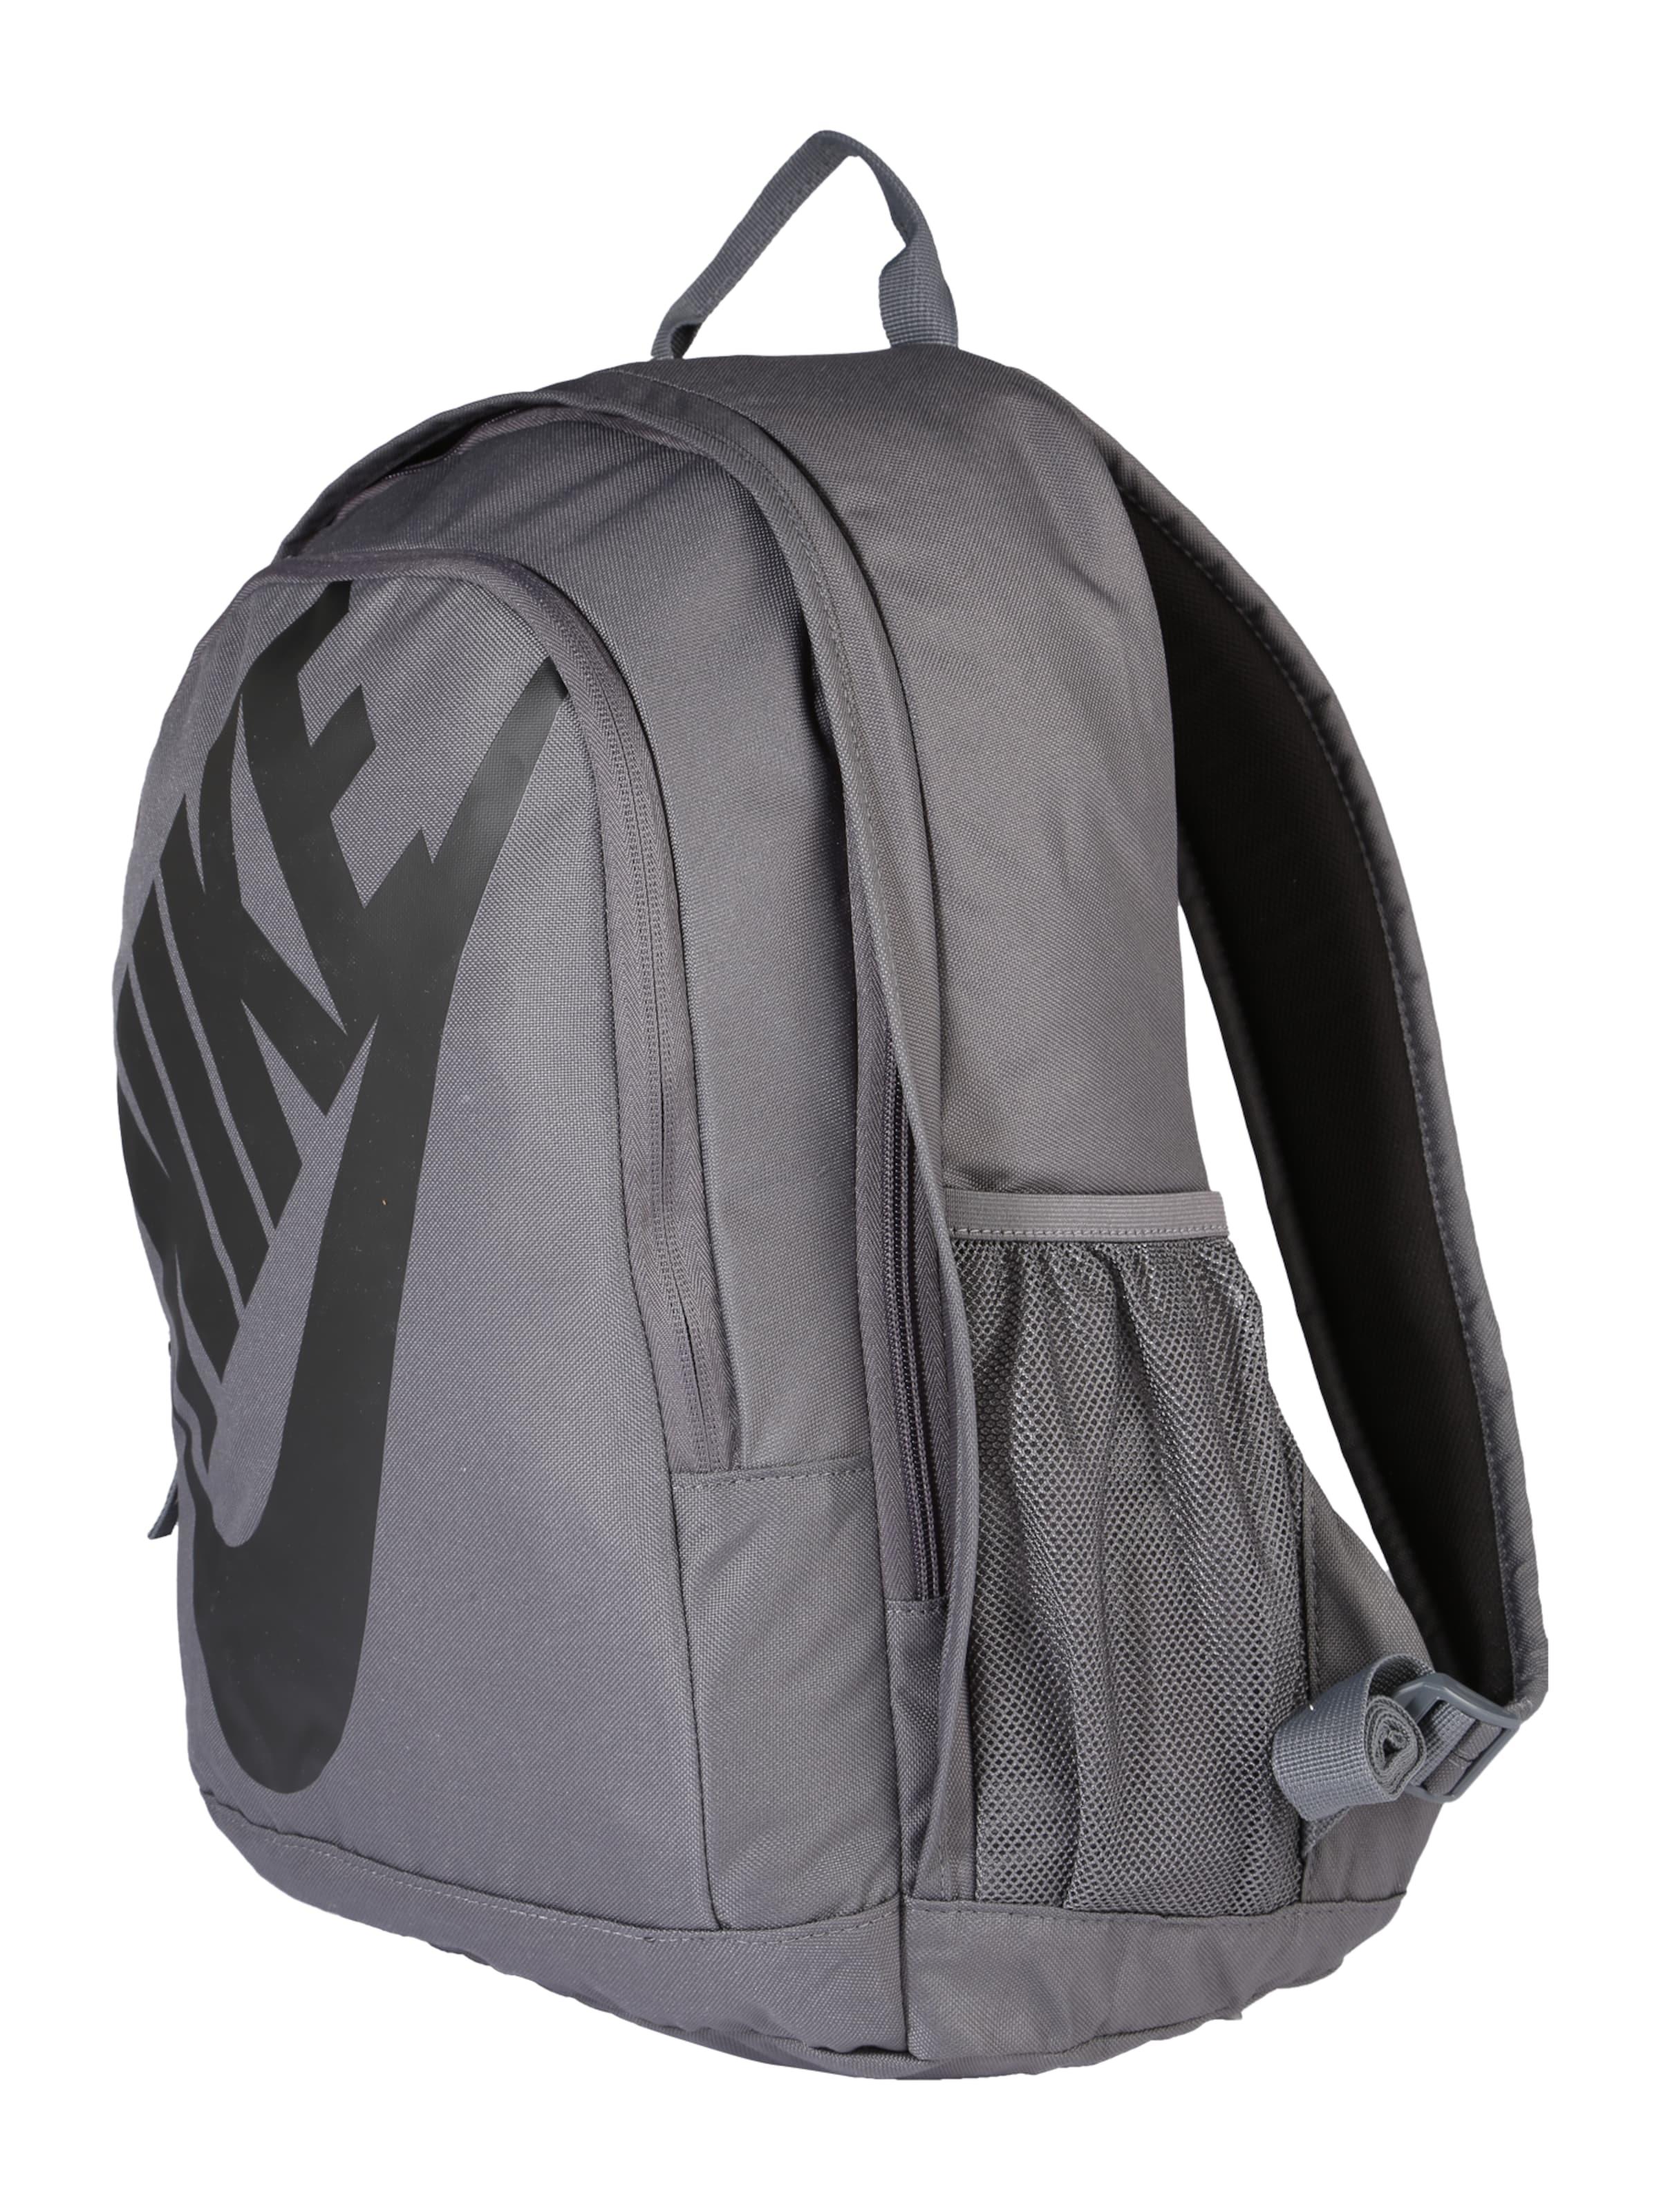 Nike 'hayward DunkelgrauSchwarz Sportswear Daypack In Futura' gf76IymvYb